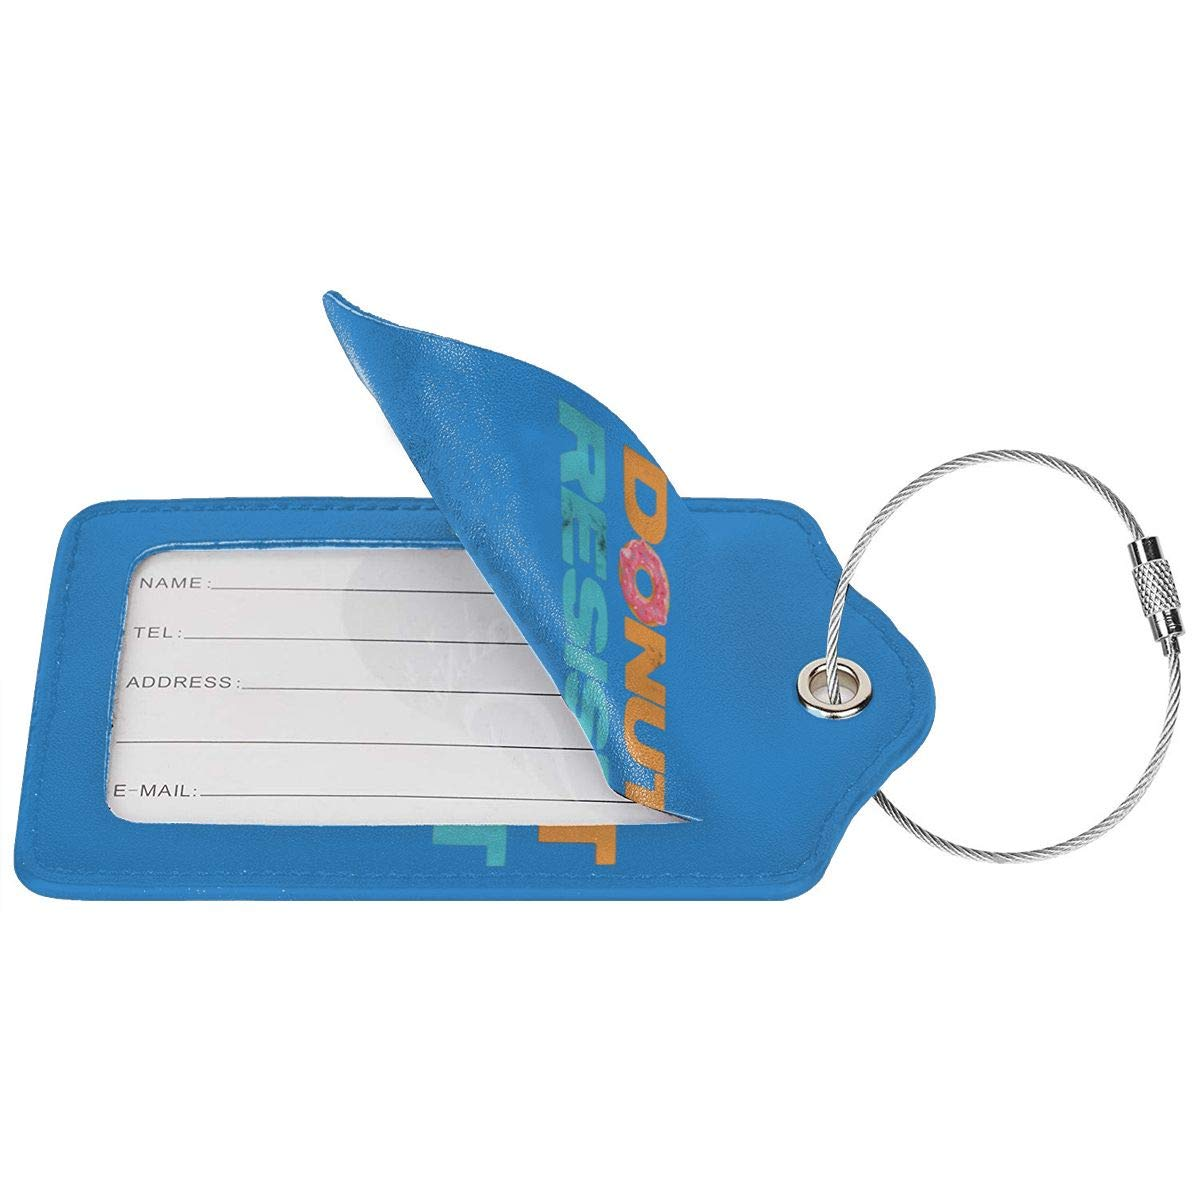 Donut Resist Pu Leather Double Sides Print Luggage Tag Mutilple Packs 1pcs,2pcs,4pcs